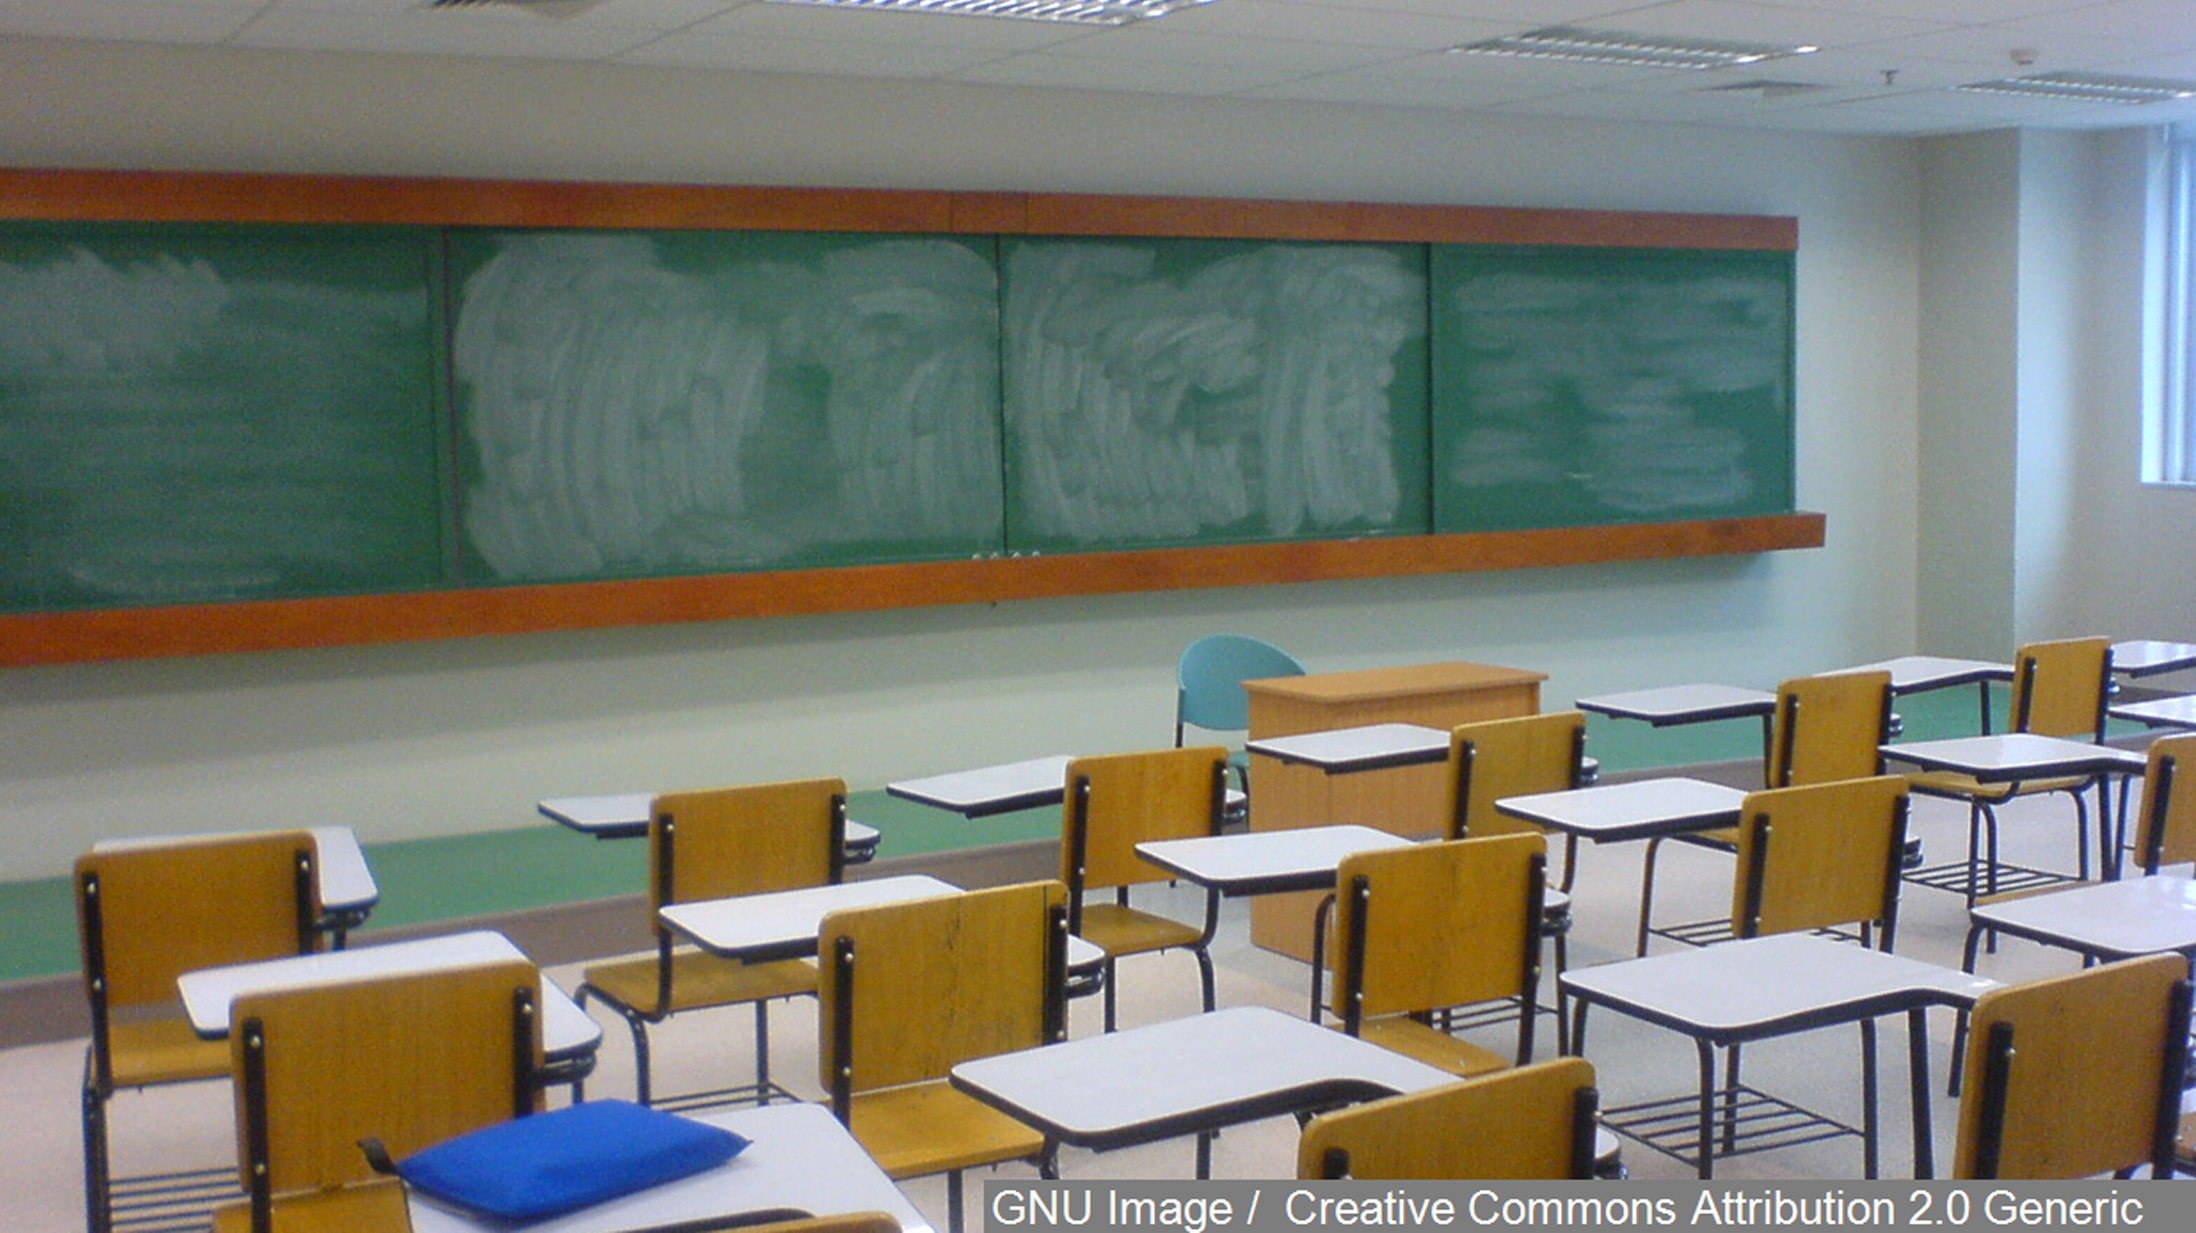 Classroom 10122015_1447822404964.jpg